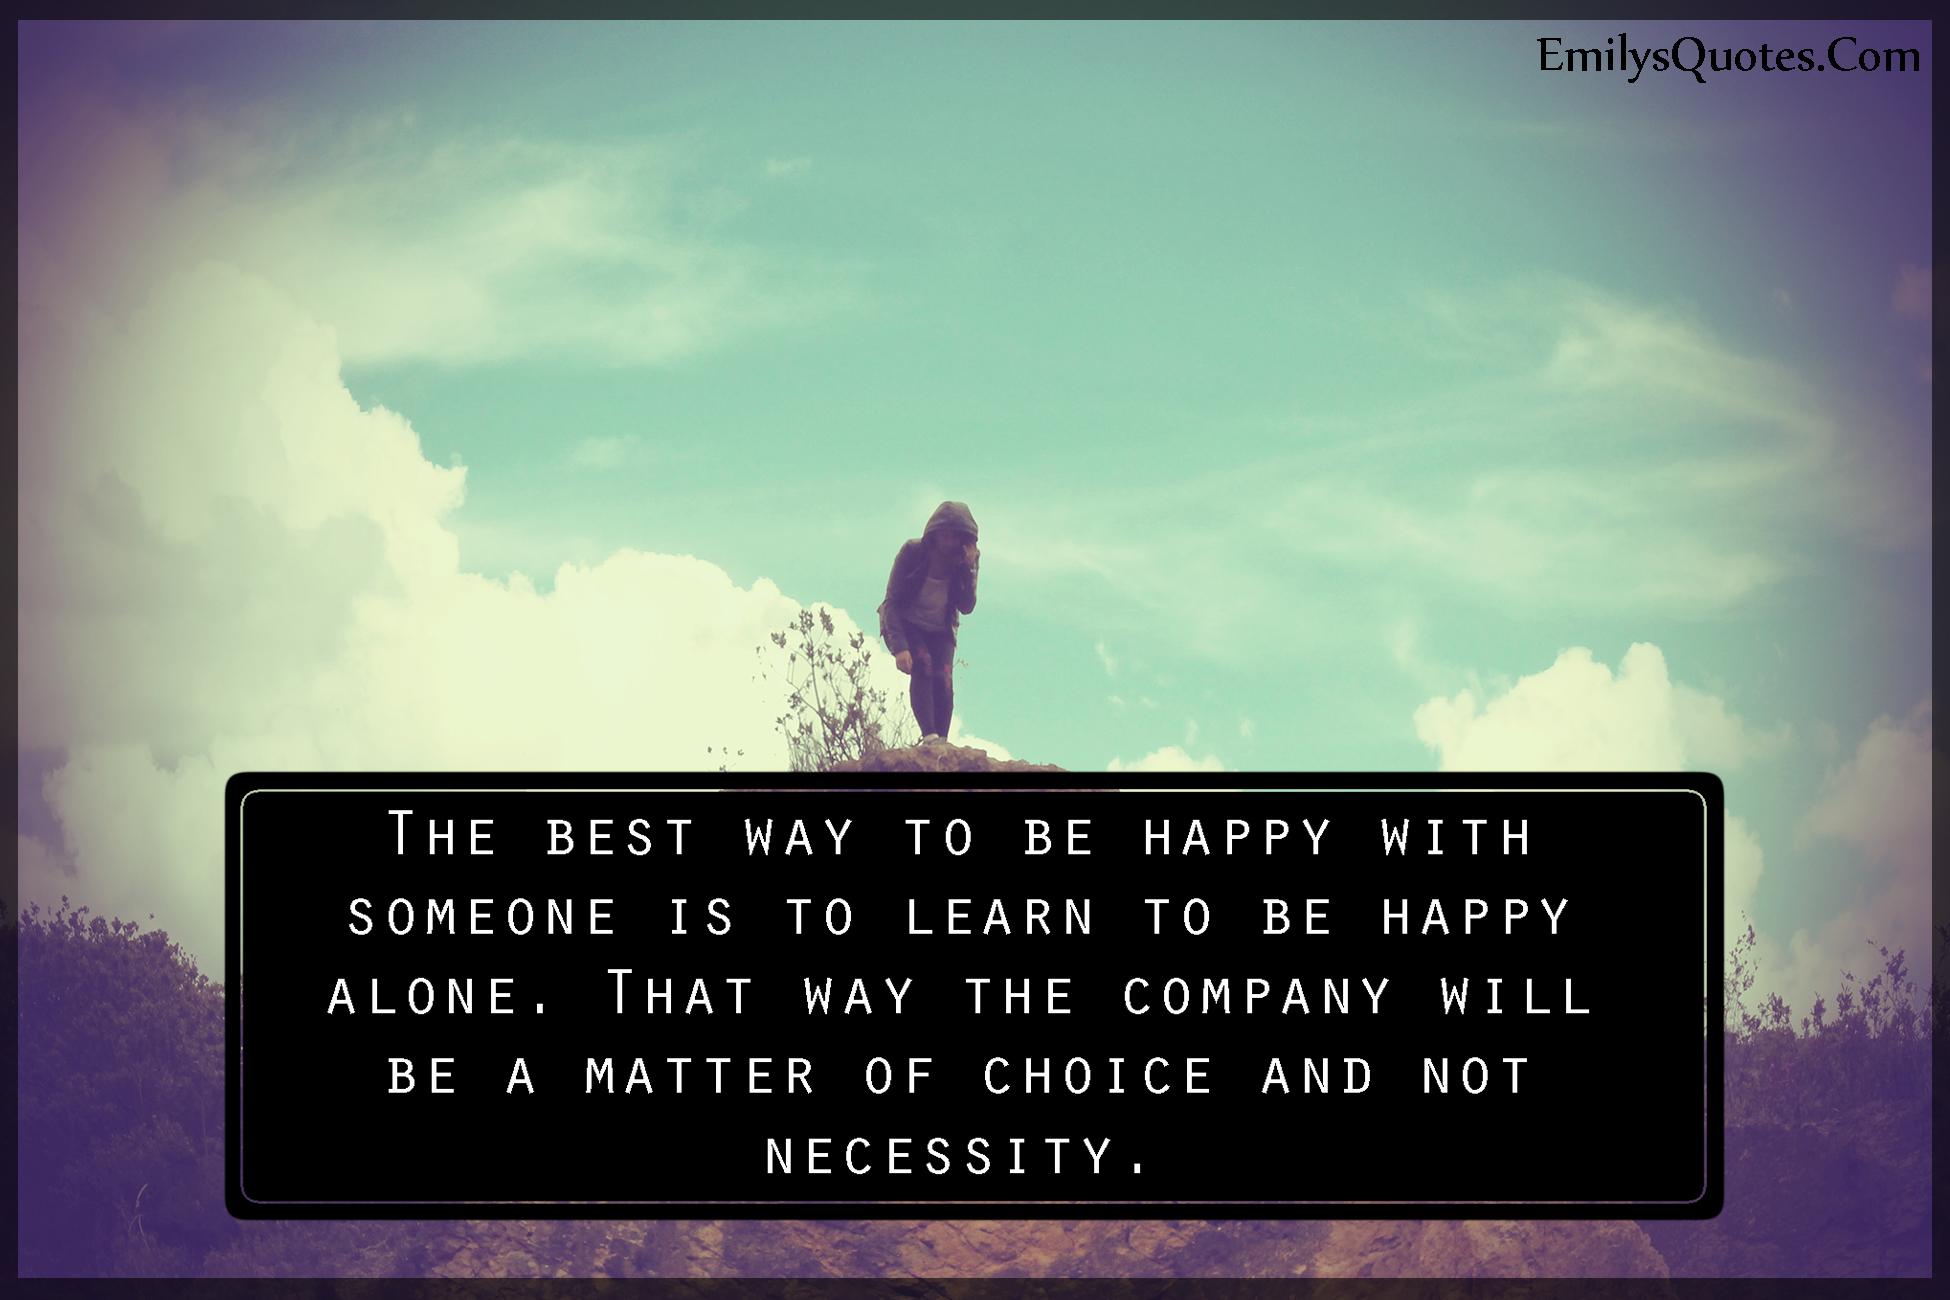 EmilysQuotes.Com - happy, alone, company, choice, learning, unknown